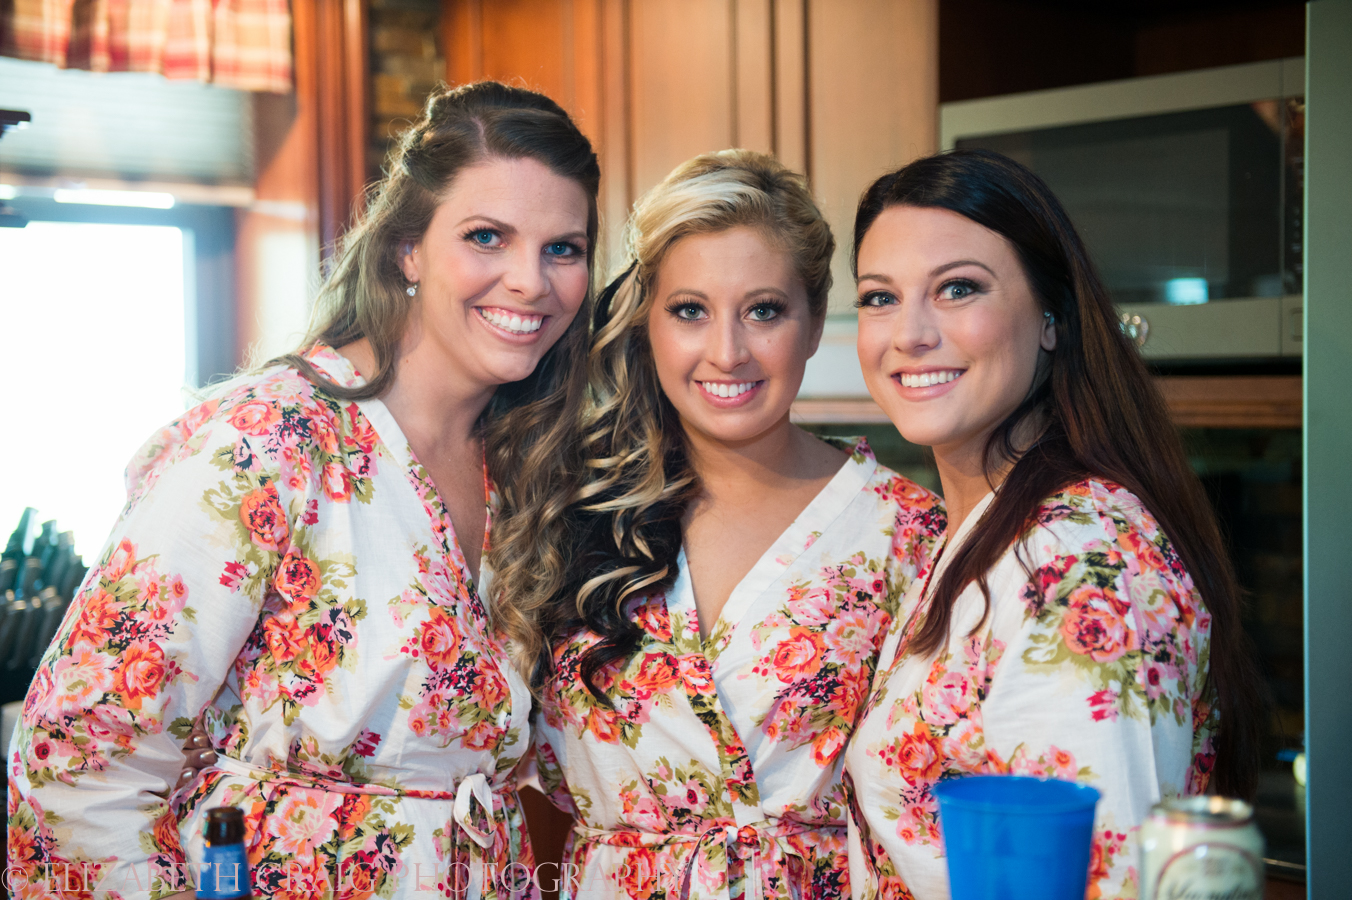 Dubois Brockway St. Marys PA Weddings-0013